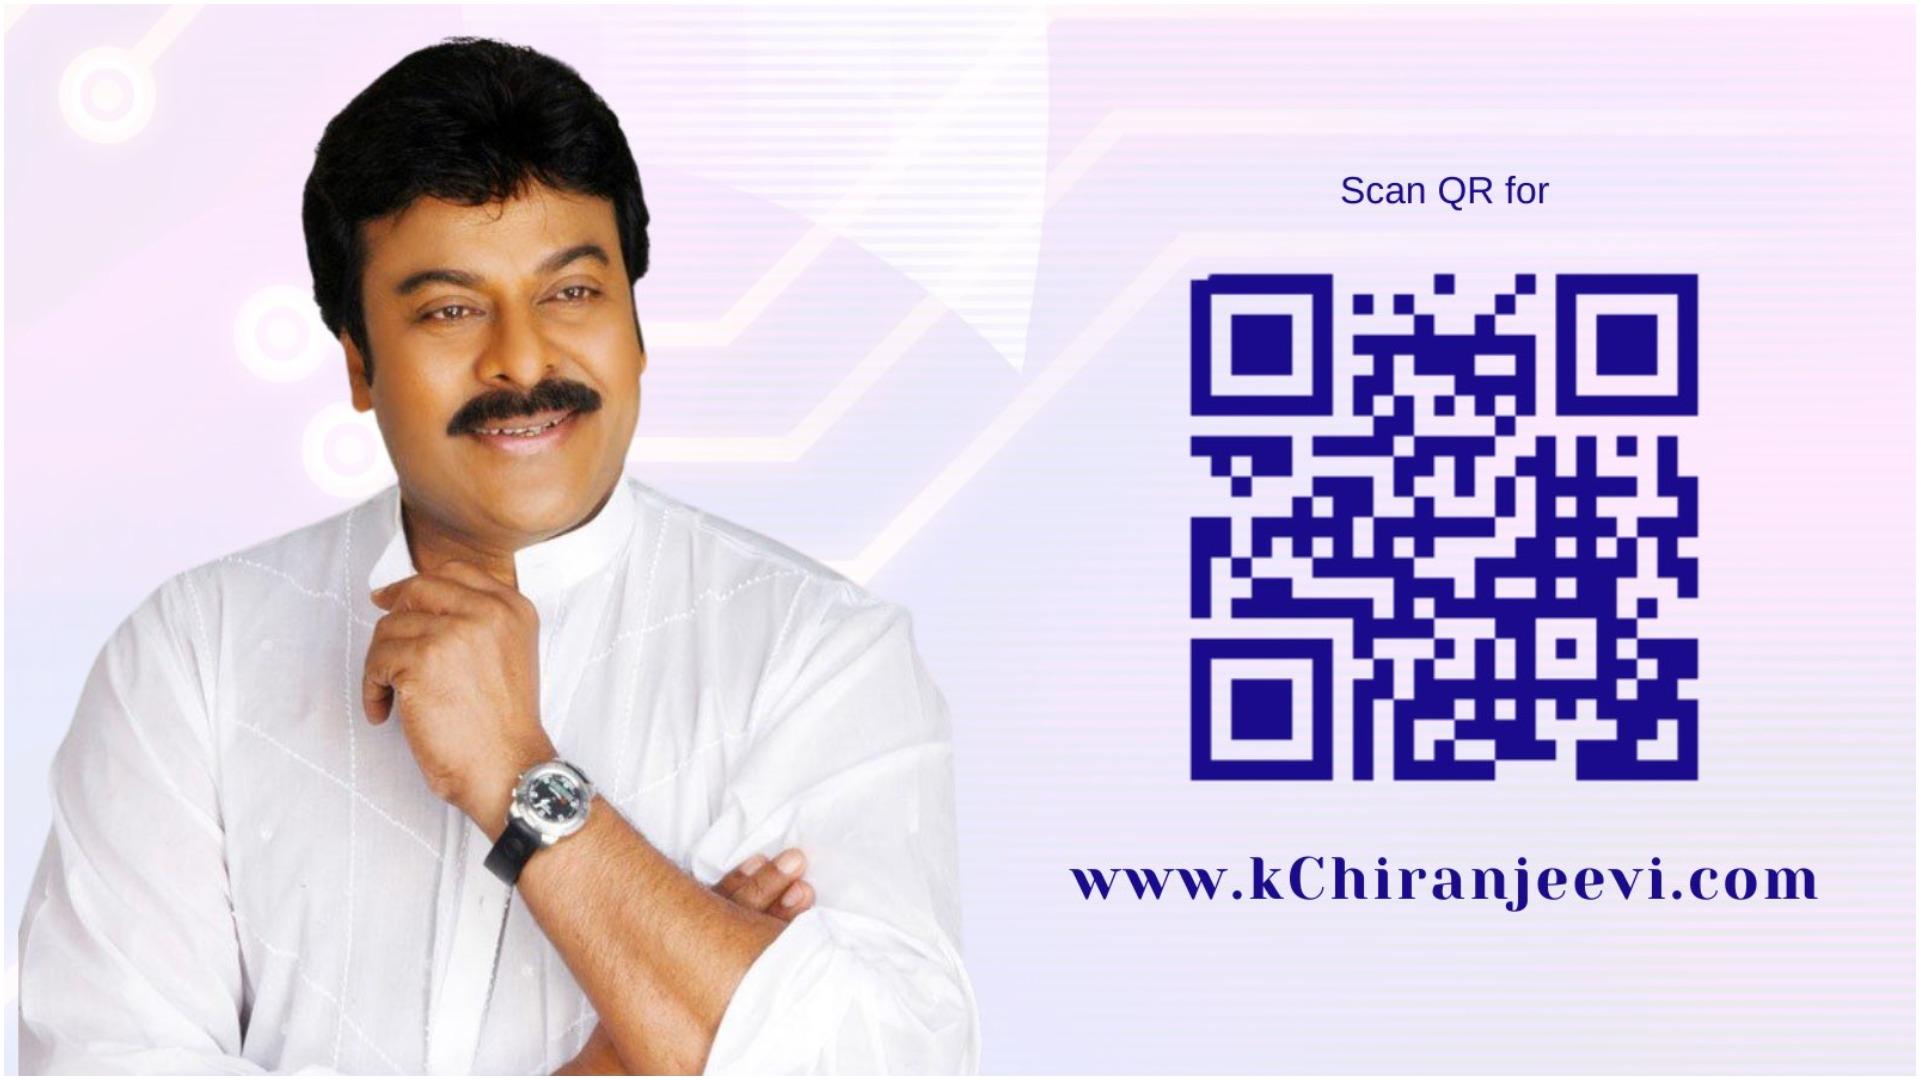 Ram Charan Teja launches 'Chiranjeevi Charitable Trust' website!